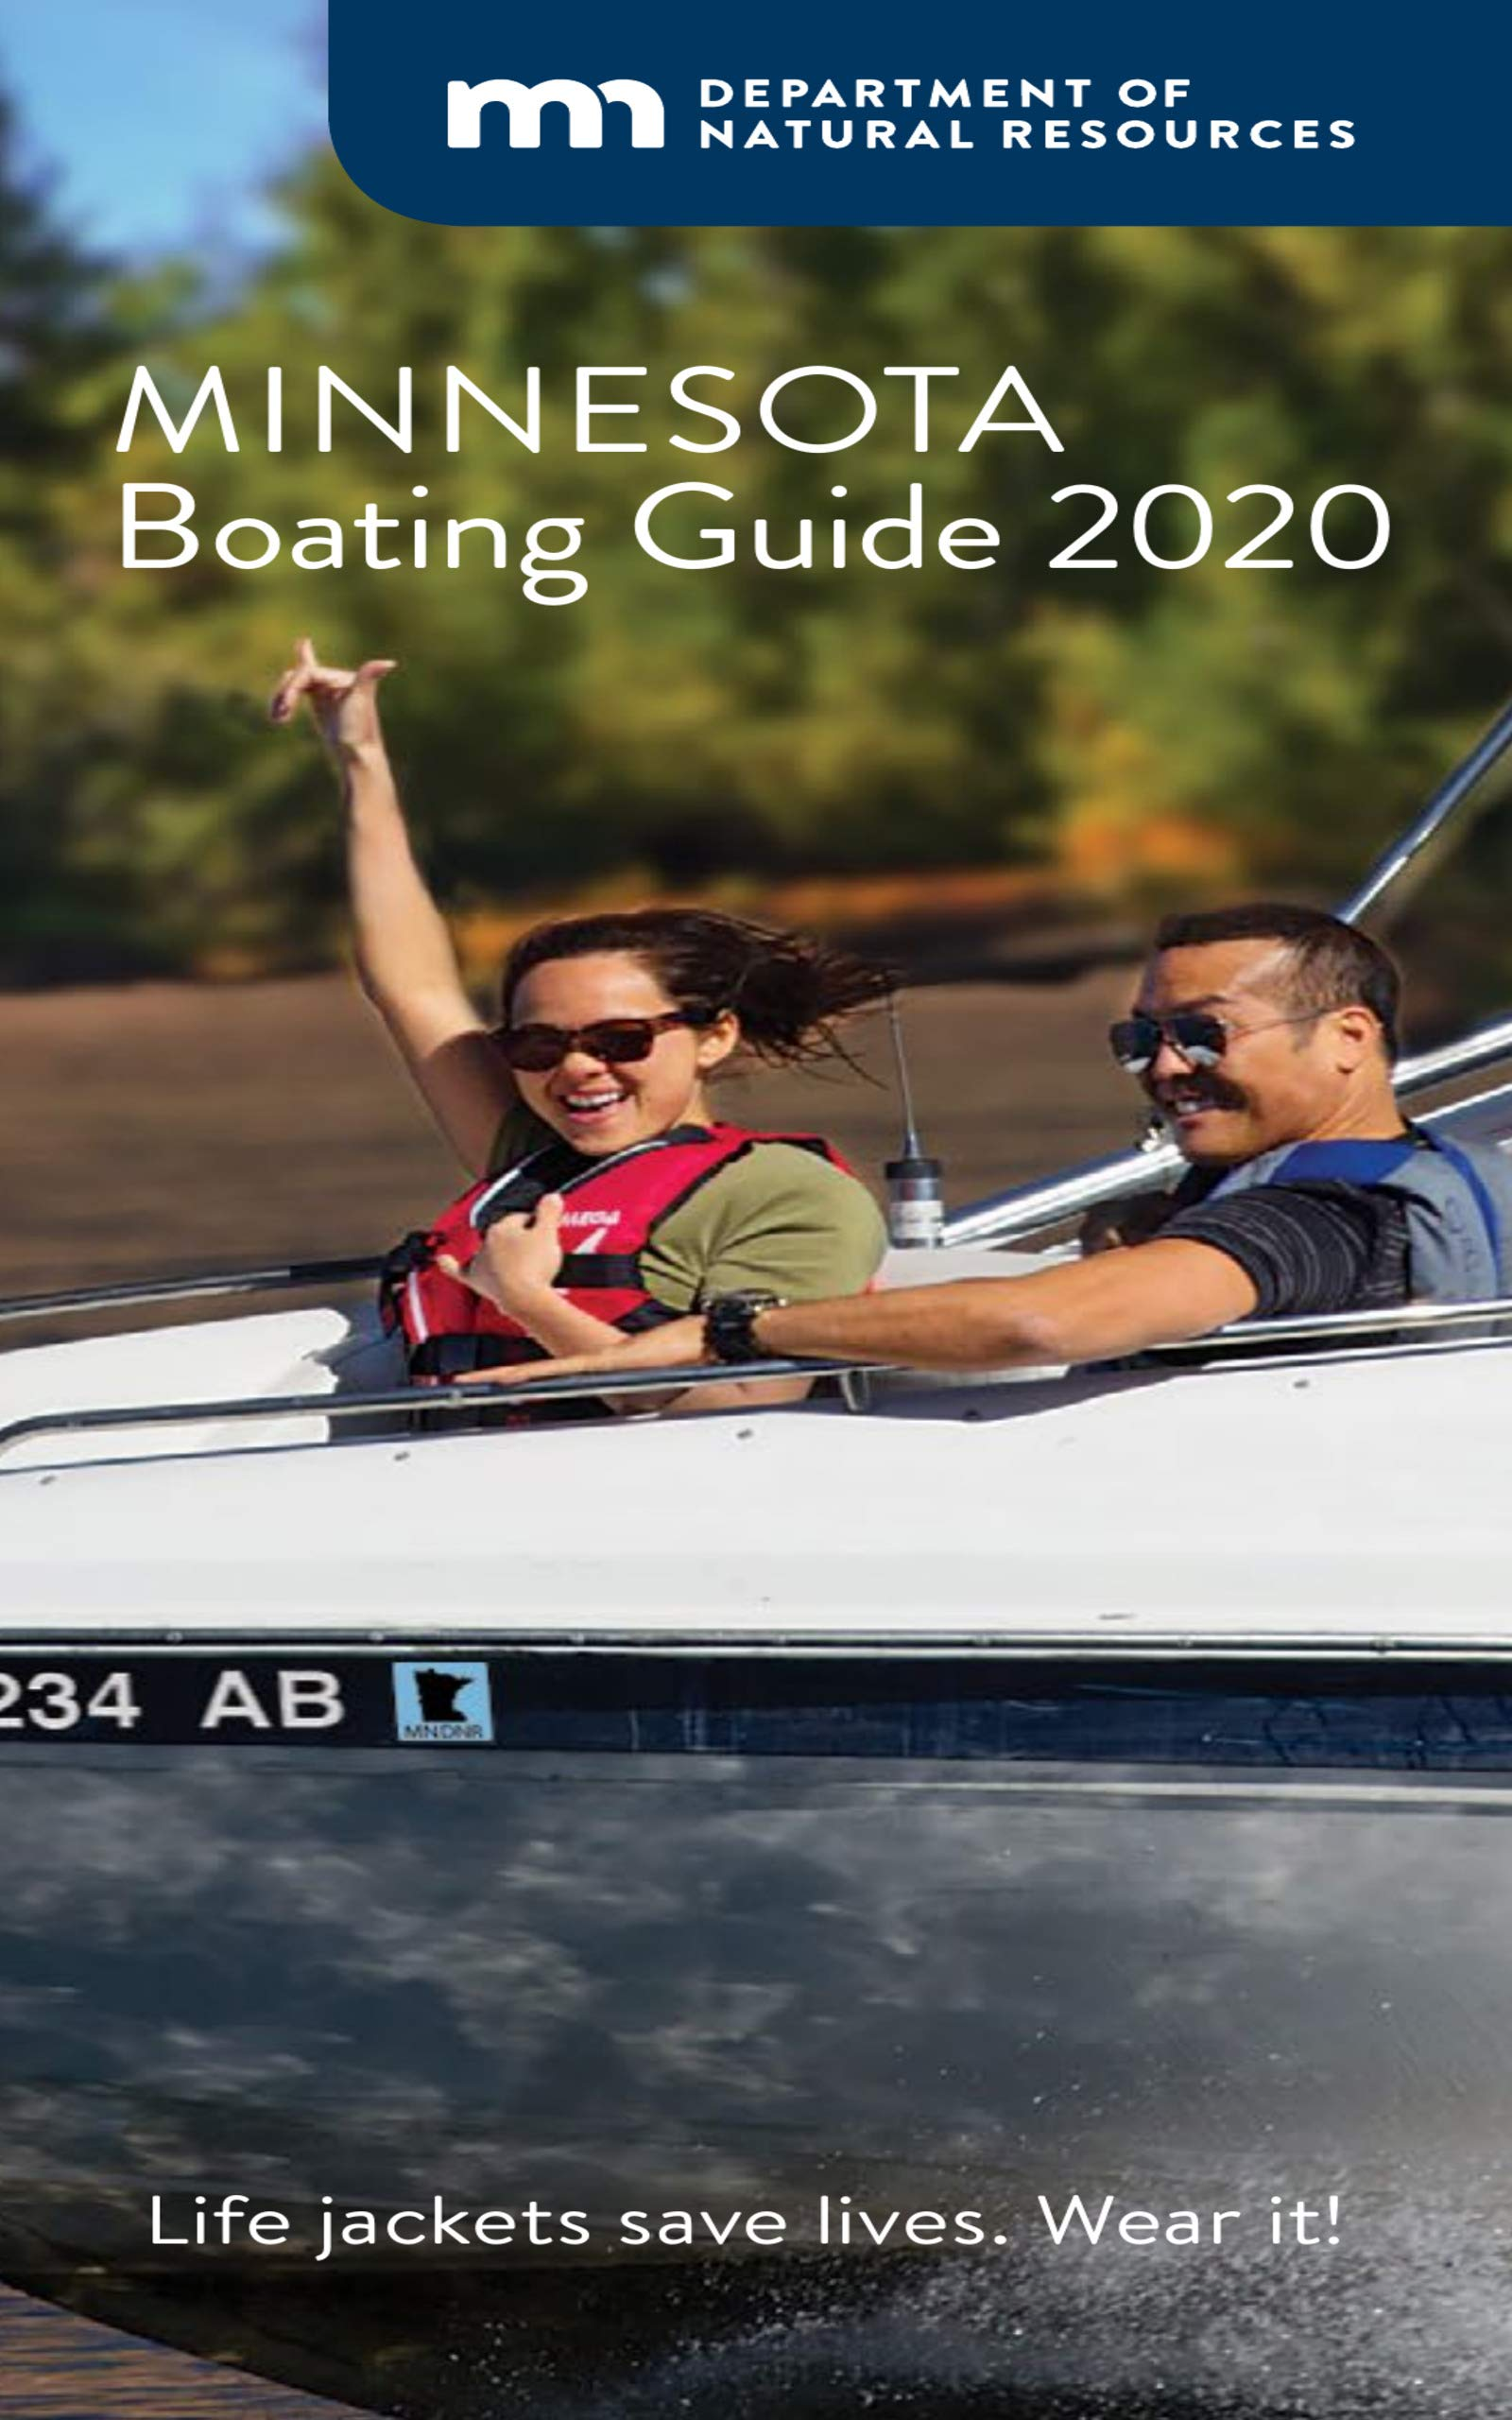 Minnesota Boating Guide 2020